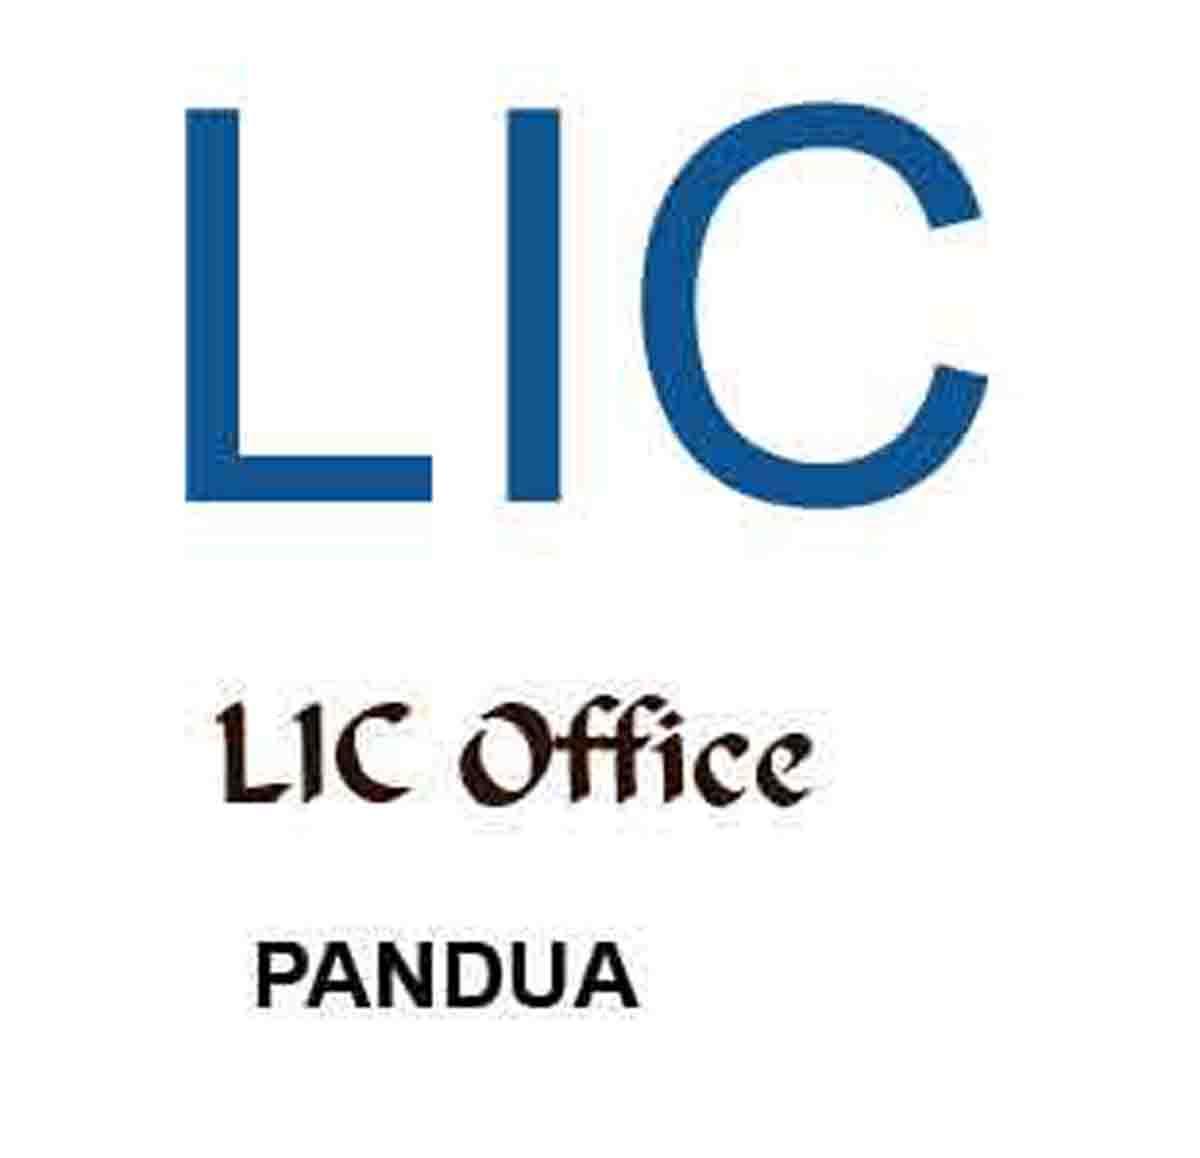 lic office pandua